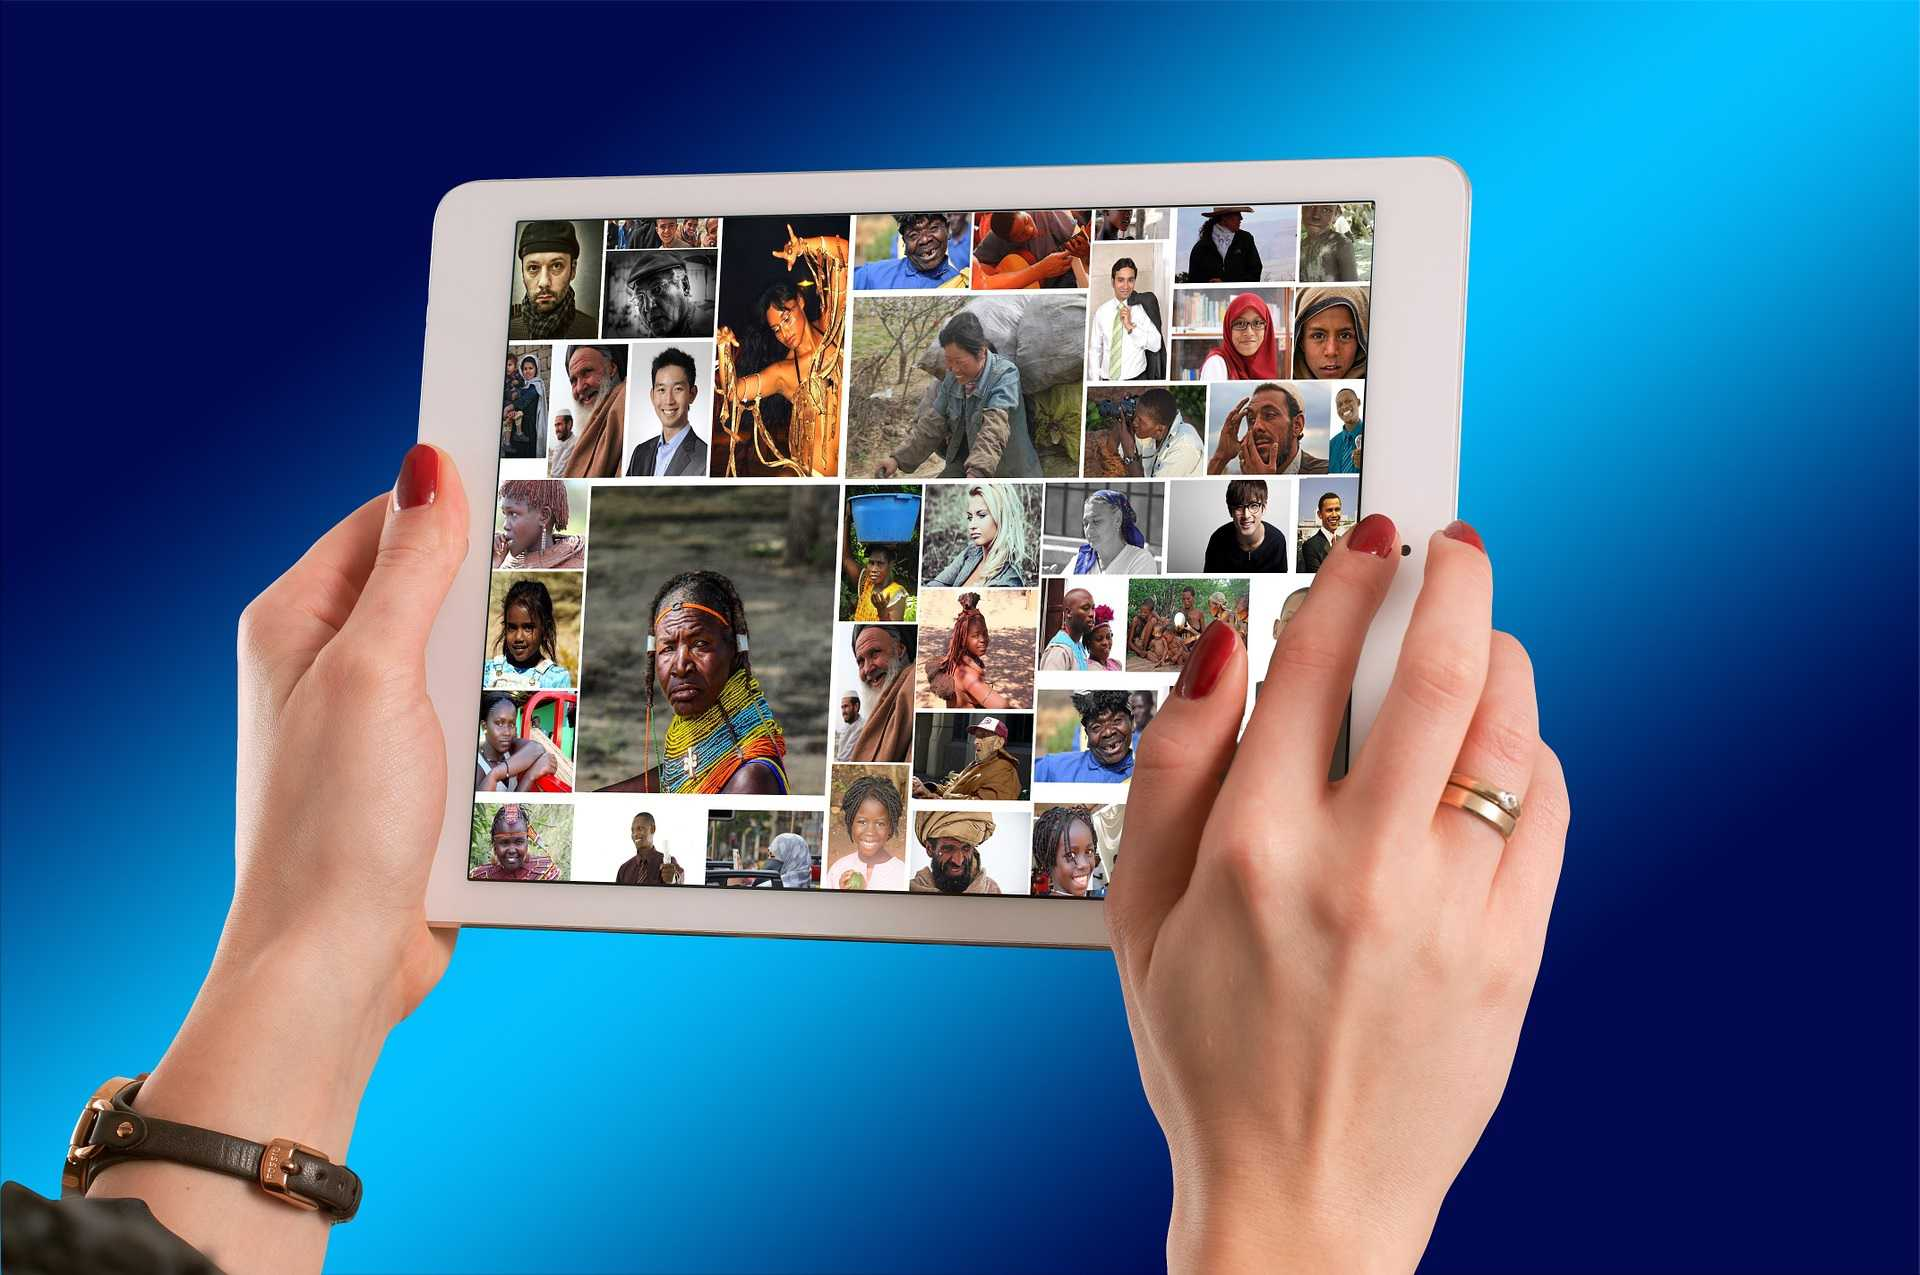 Hands holding an iPad